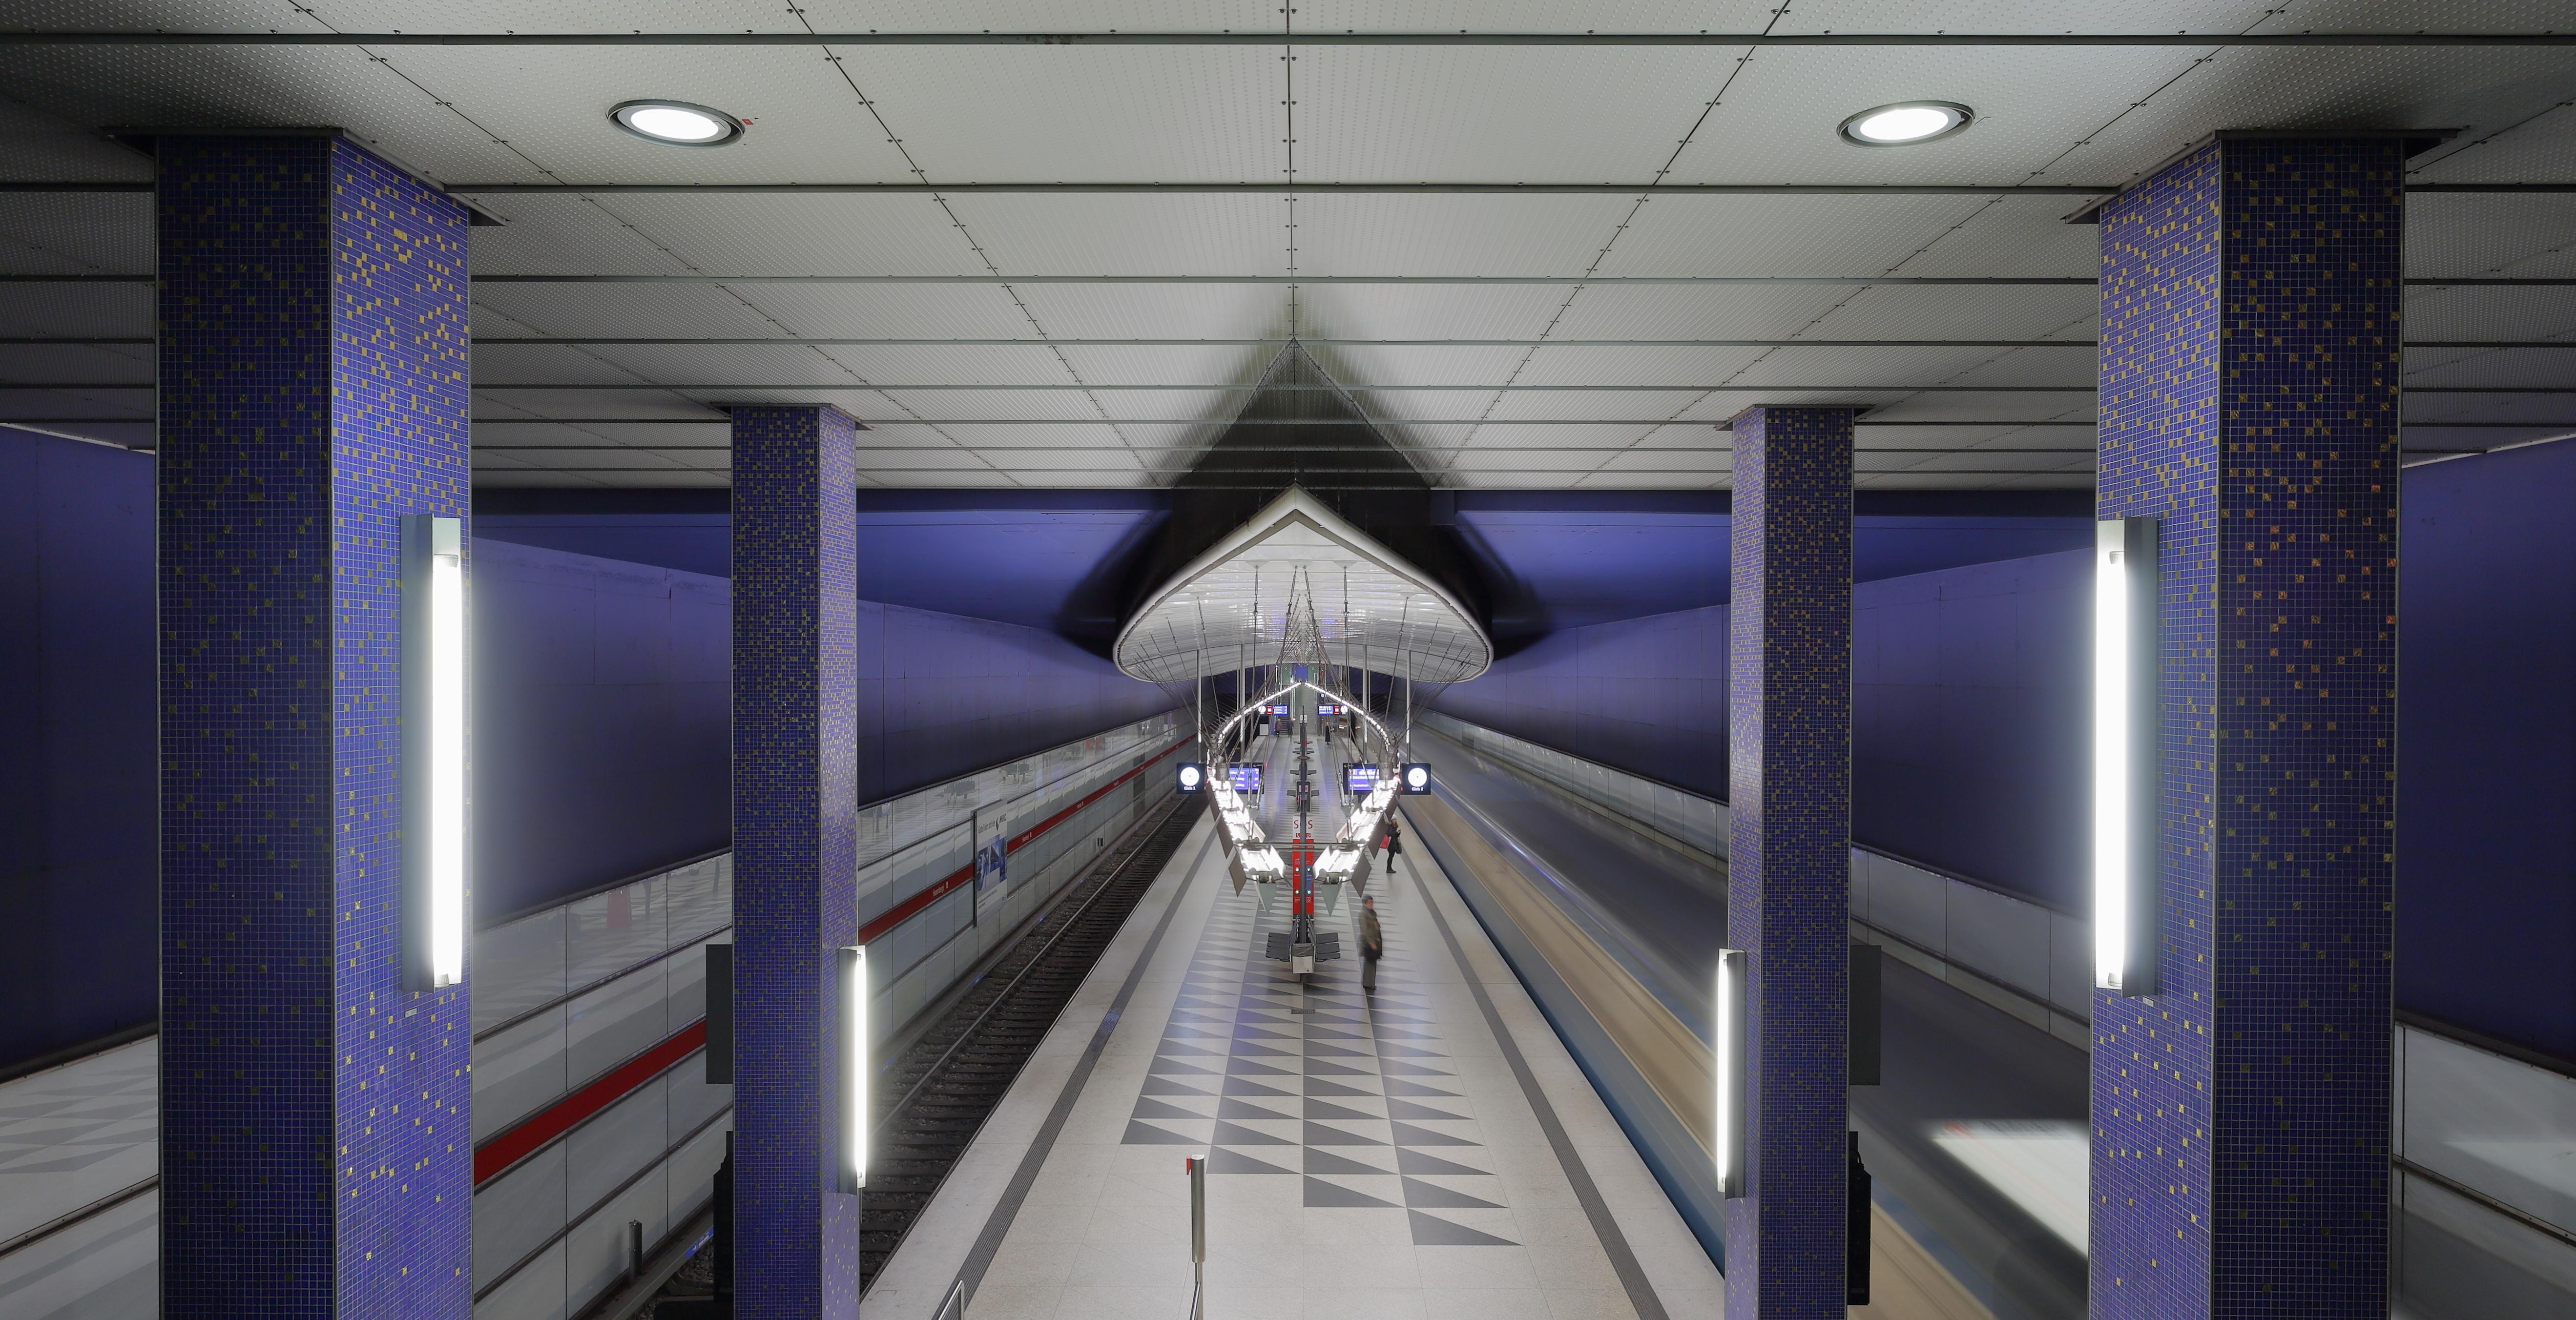 Hasenbergl (metropolitana di Monaco di Baviera)